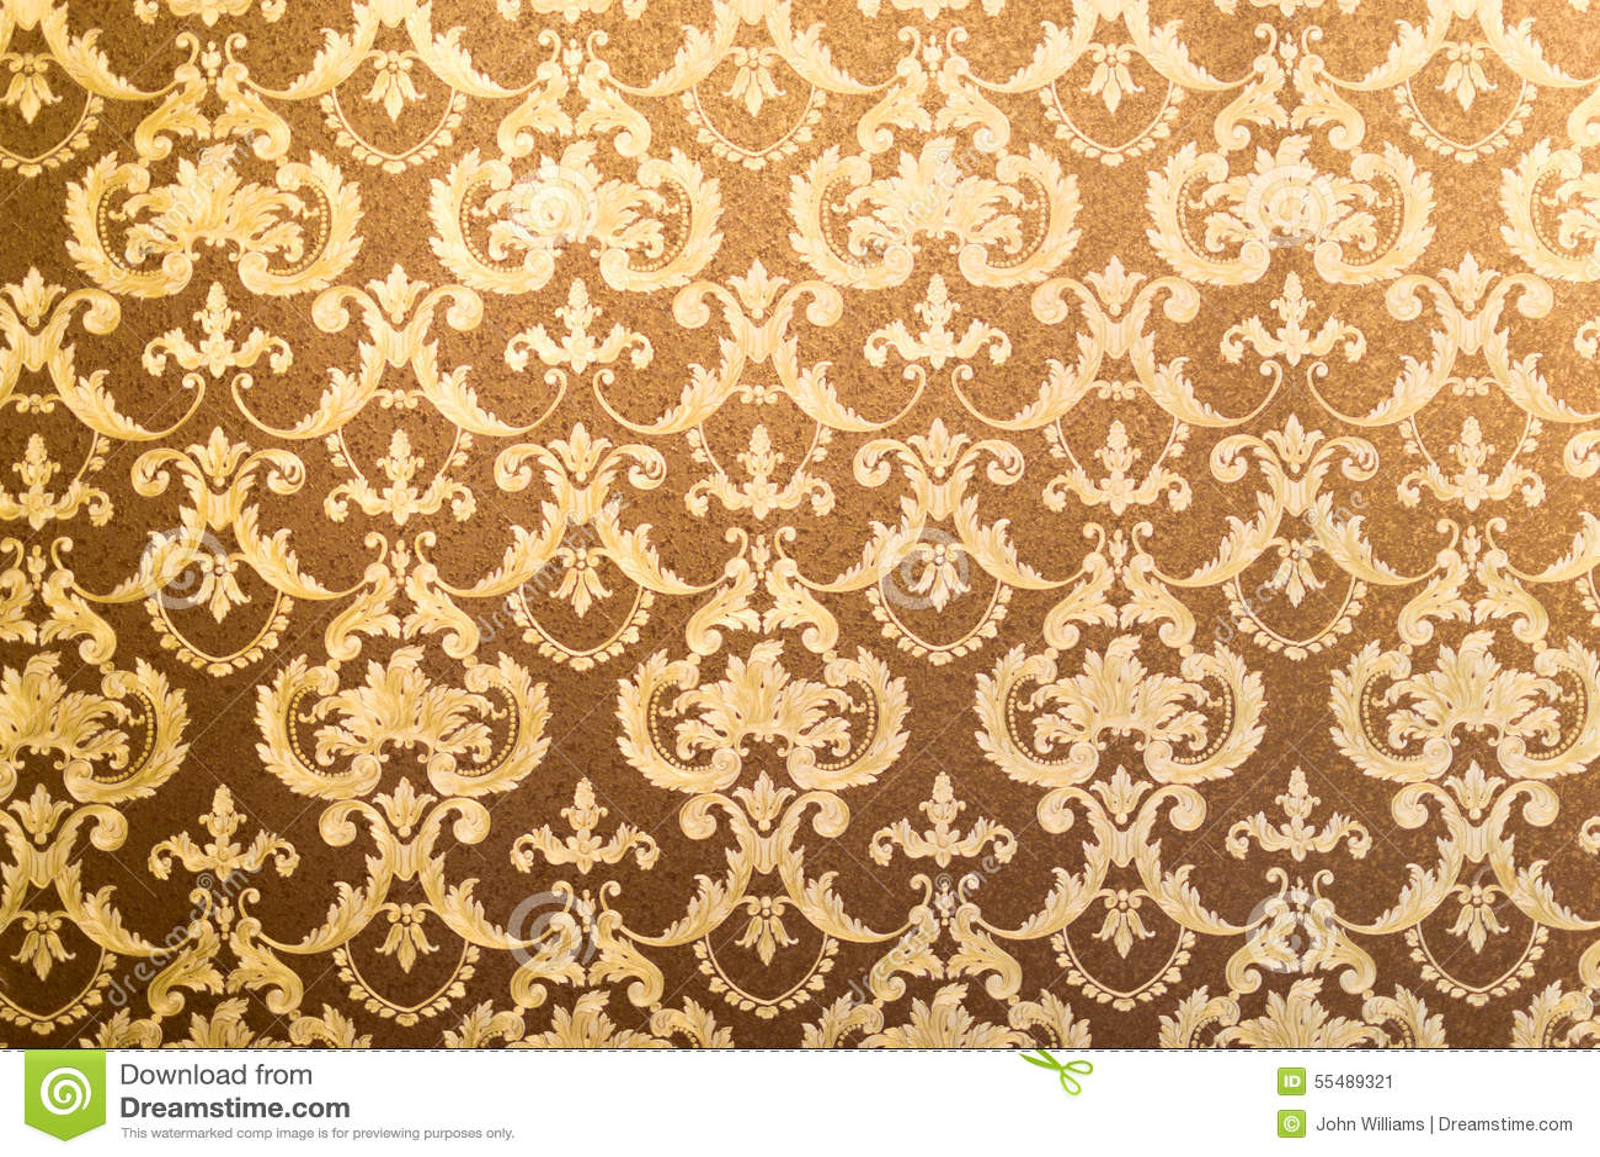 Fondo floral dorado de la pared imagen de archivo imagen for Papel de pared dorado